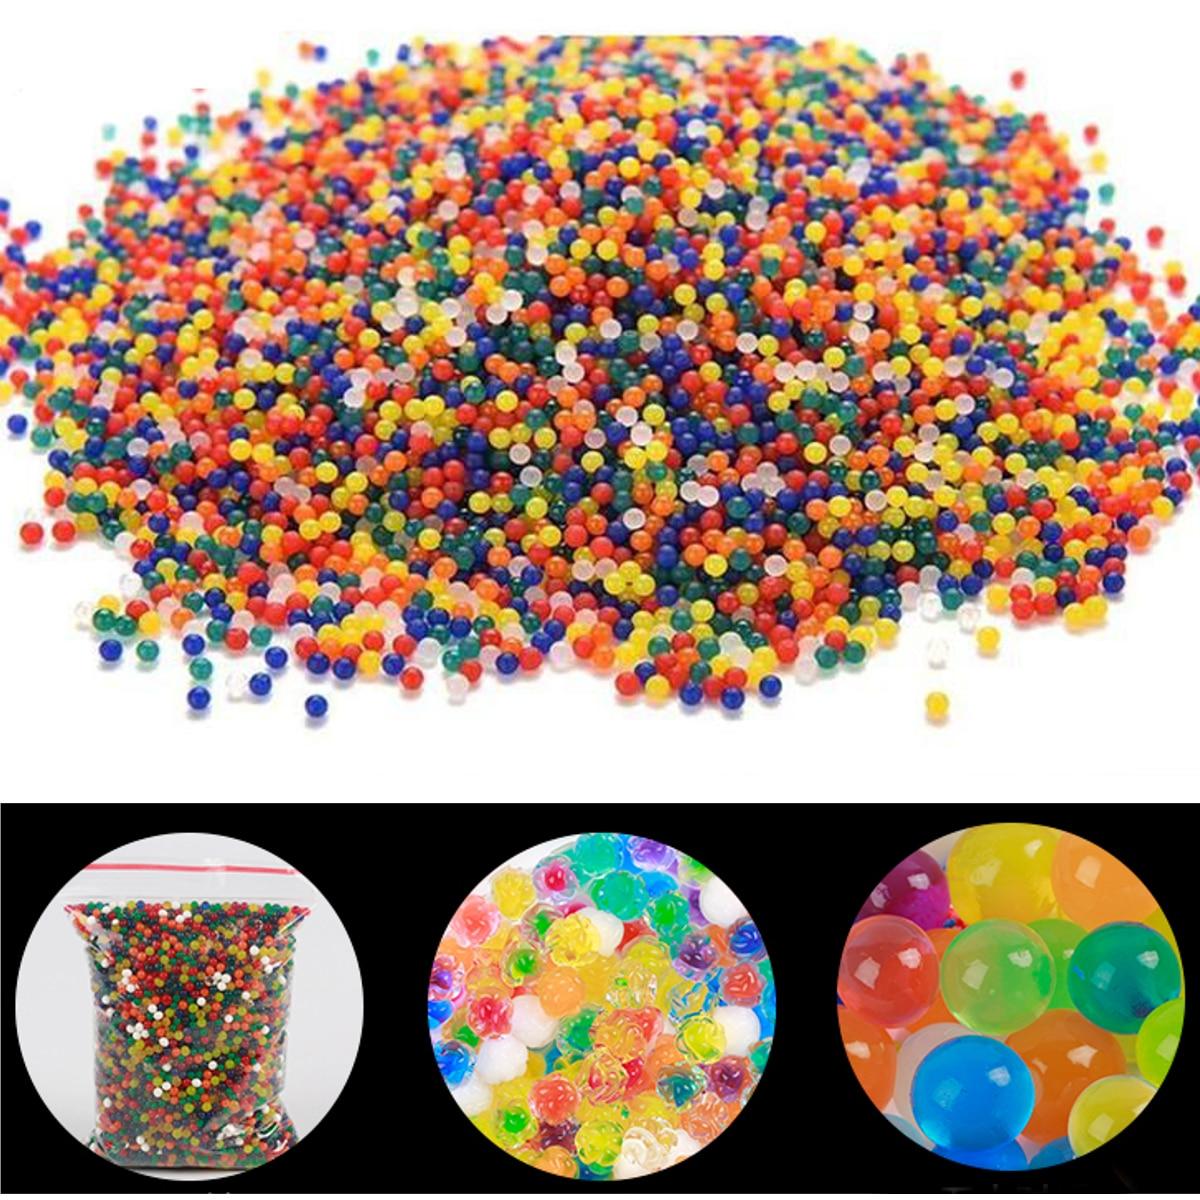 Image 2 - JIMITU 10000pcs/bag Crystal Soil Hydrogel Gel Polymer Orbiz Water Beads Flower/Wedding/Decoration Maison Growing Water Balls-in Toy Balls from Toys & Hobbies